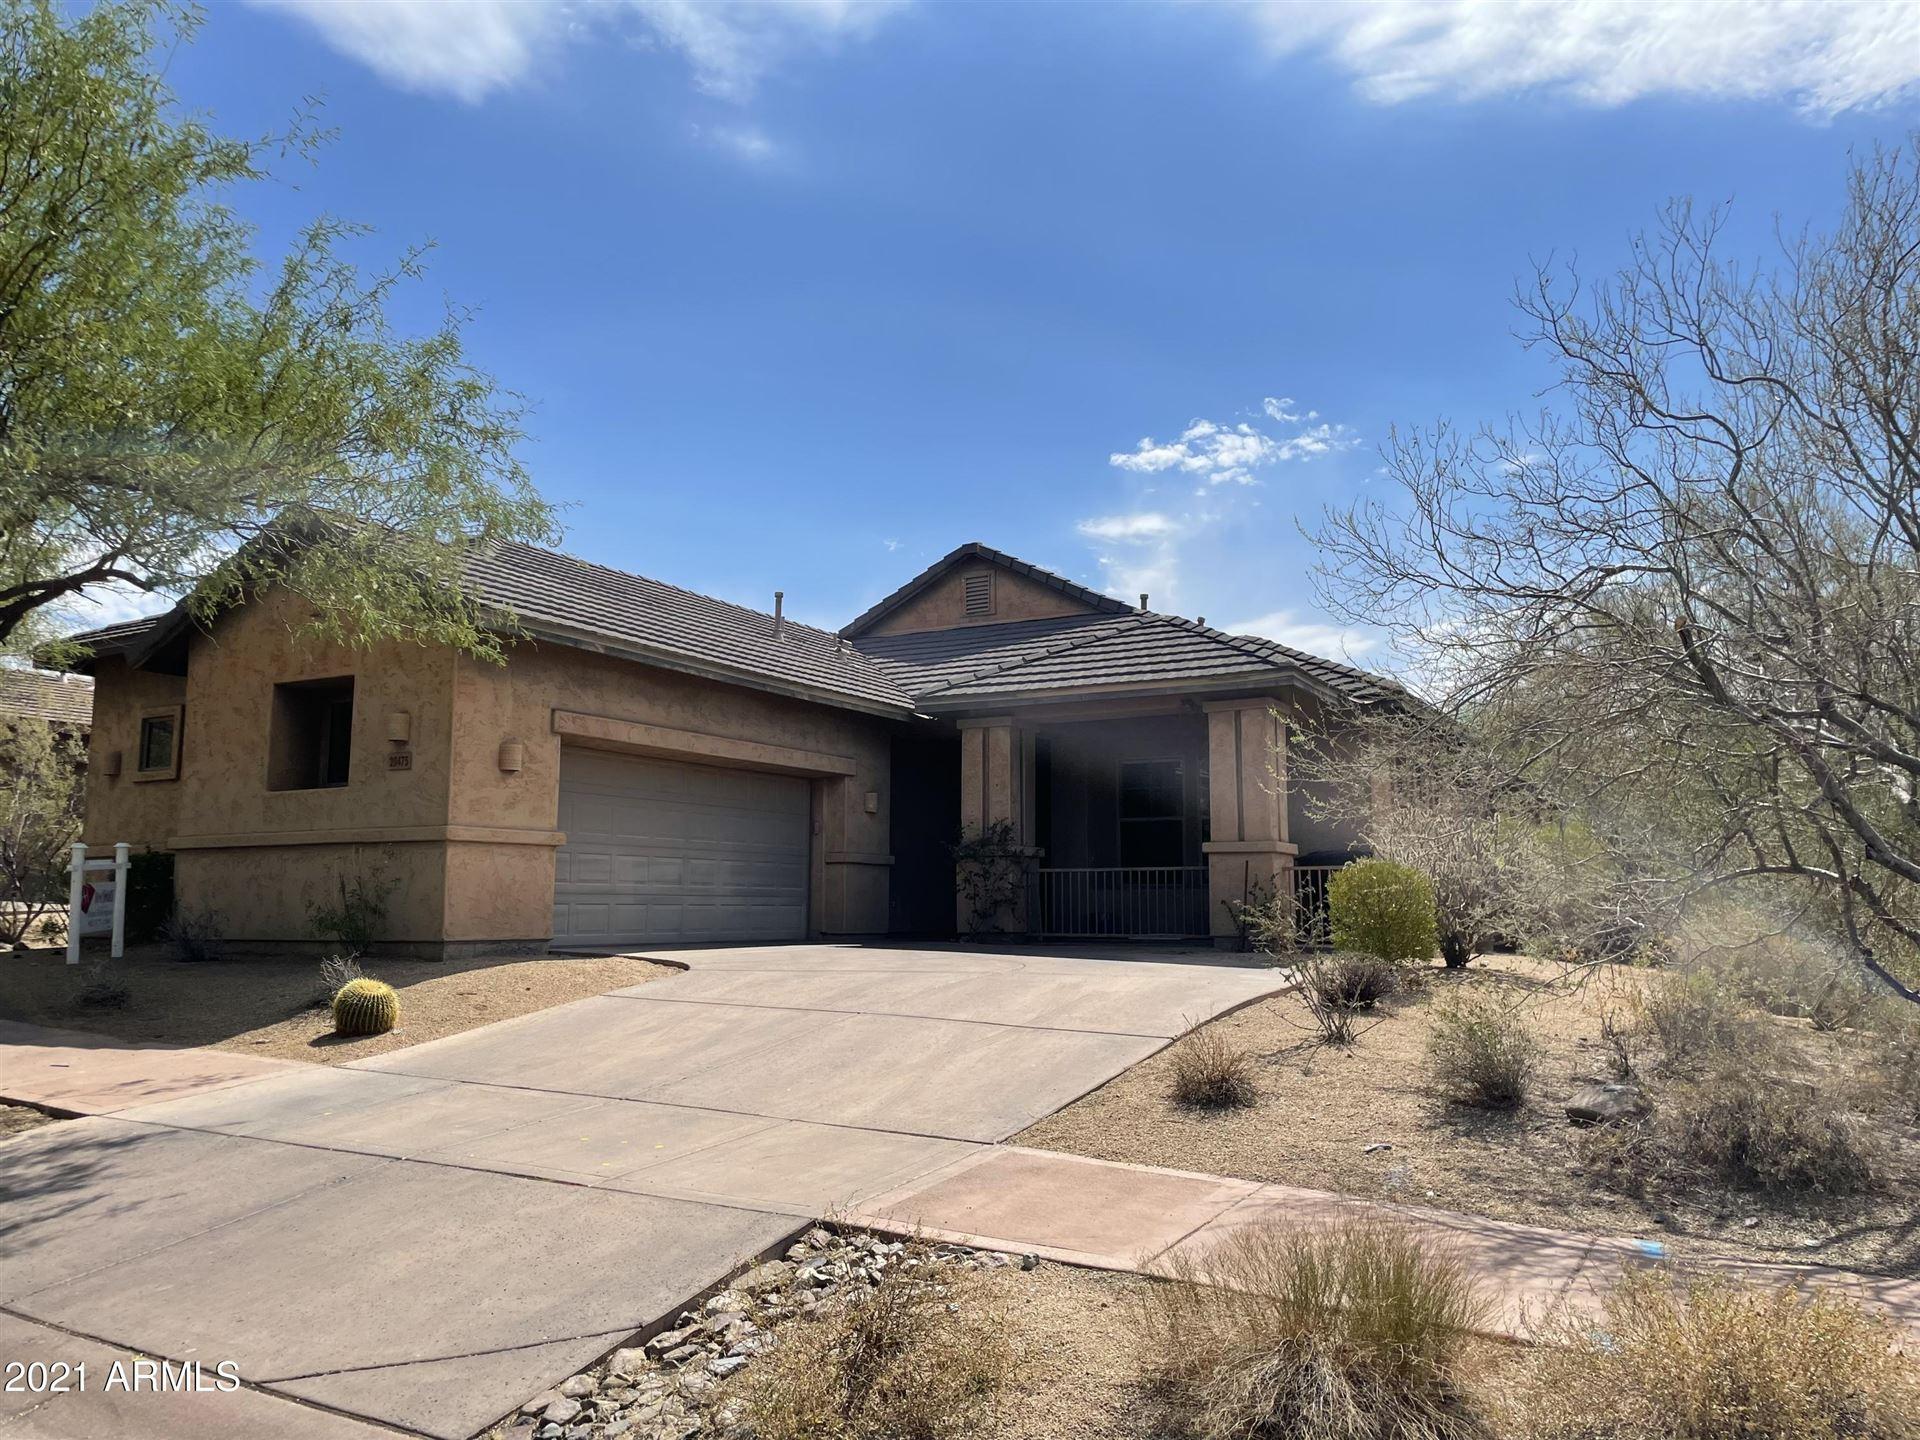 Photo of 20475 N 95th Street, Scottsdale, AZ 85255 (MLS # 6196161)